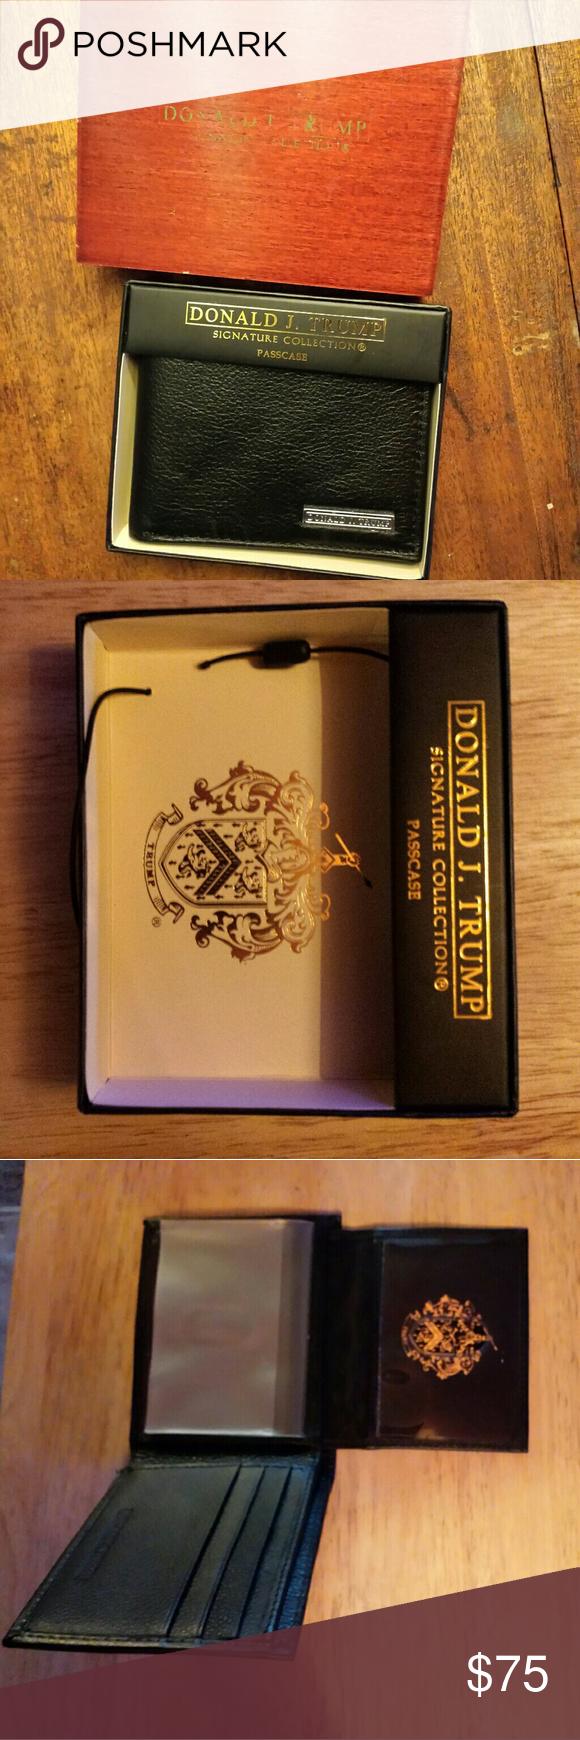 Donald J Trump Signature Collection Passcase Rare Signature Collection Signature Collectable Items